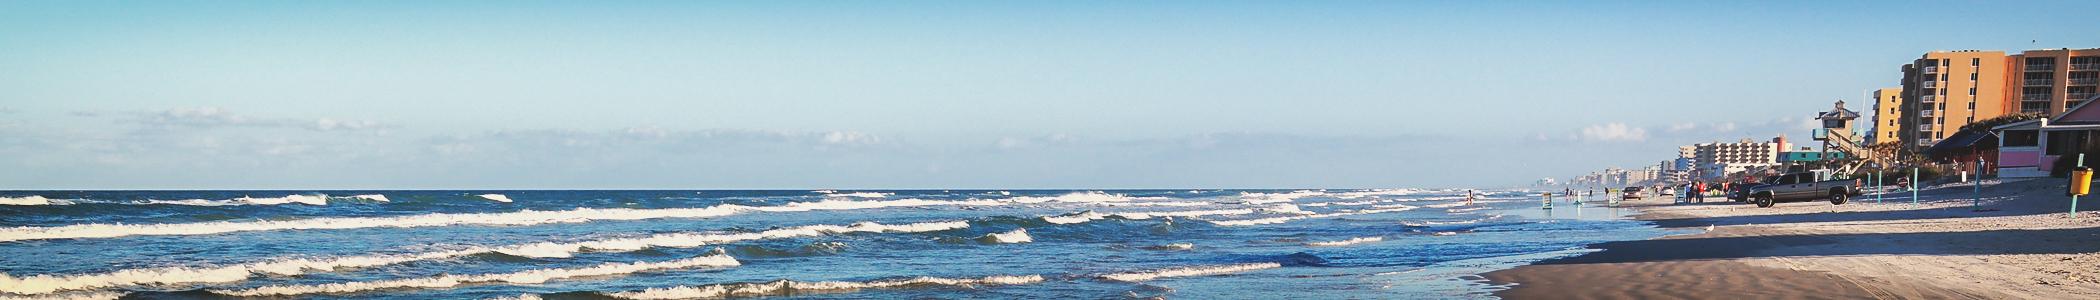 WV_Banner_New_Smyrna_Beach